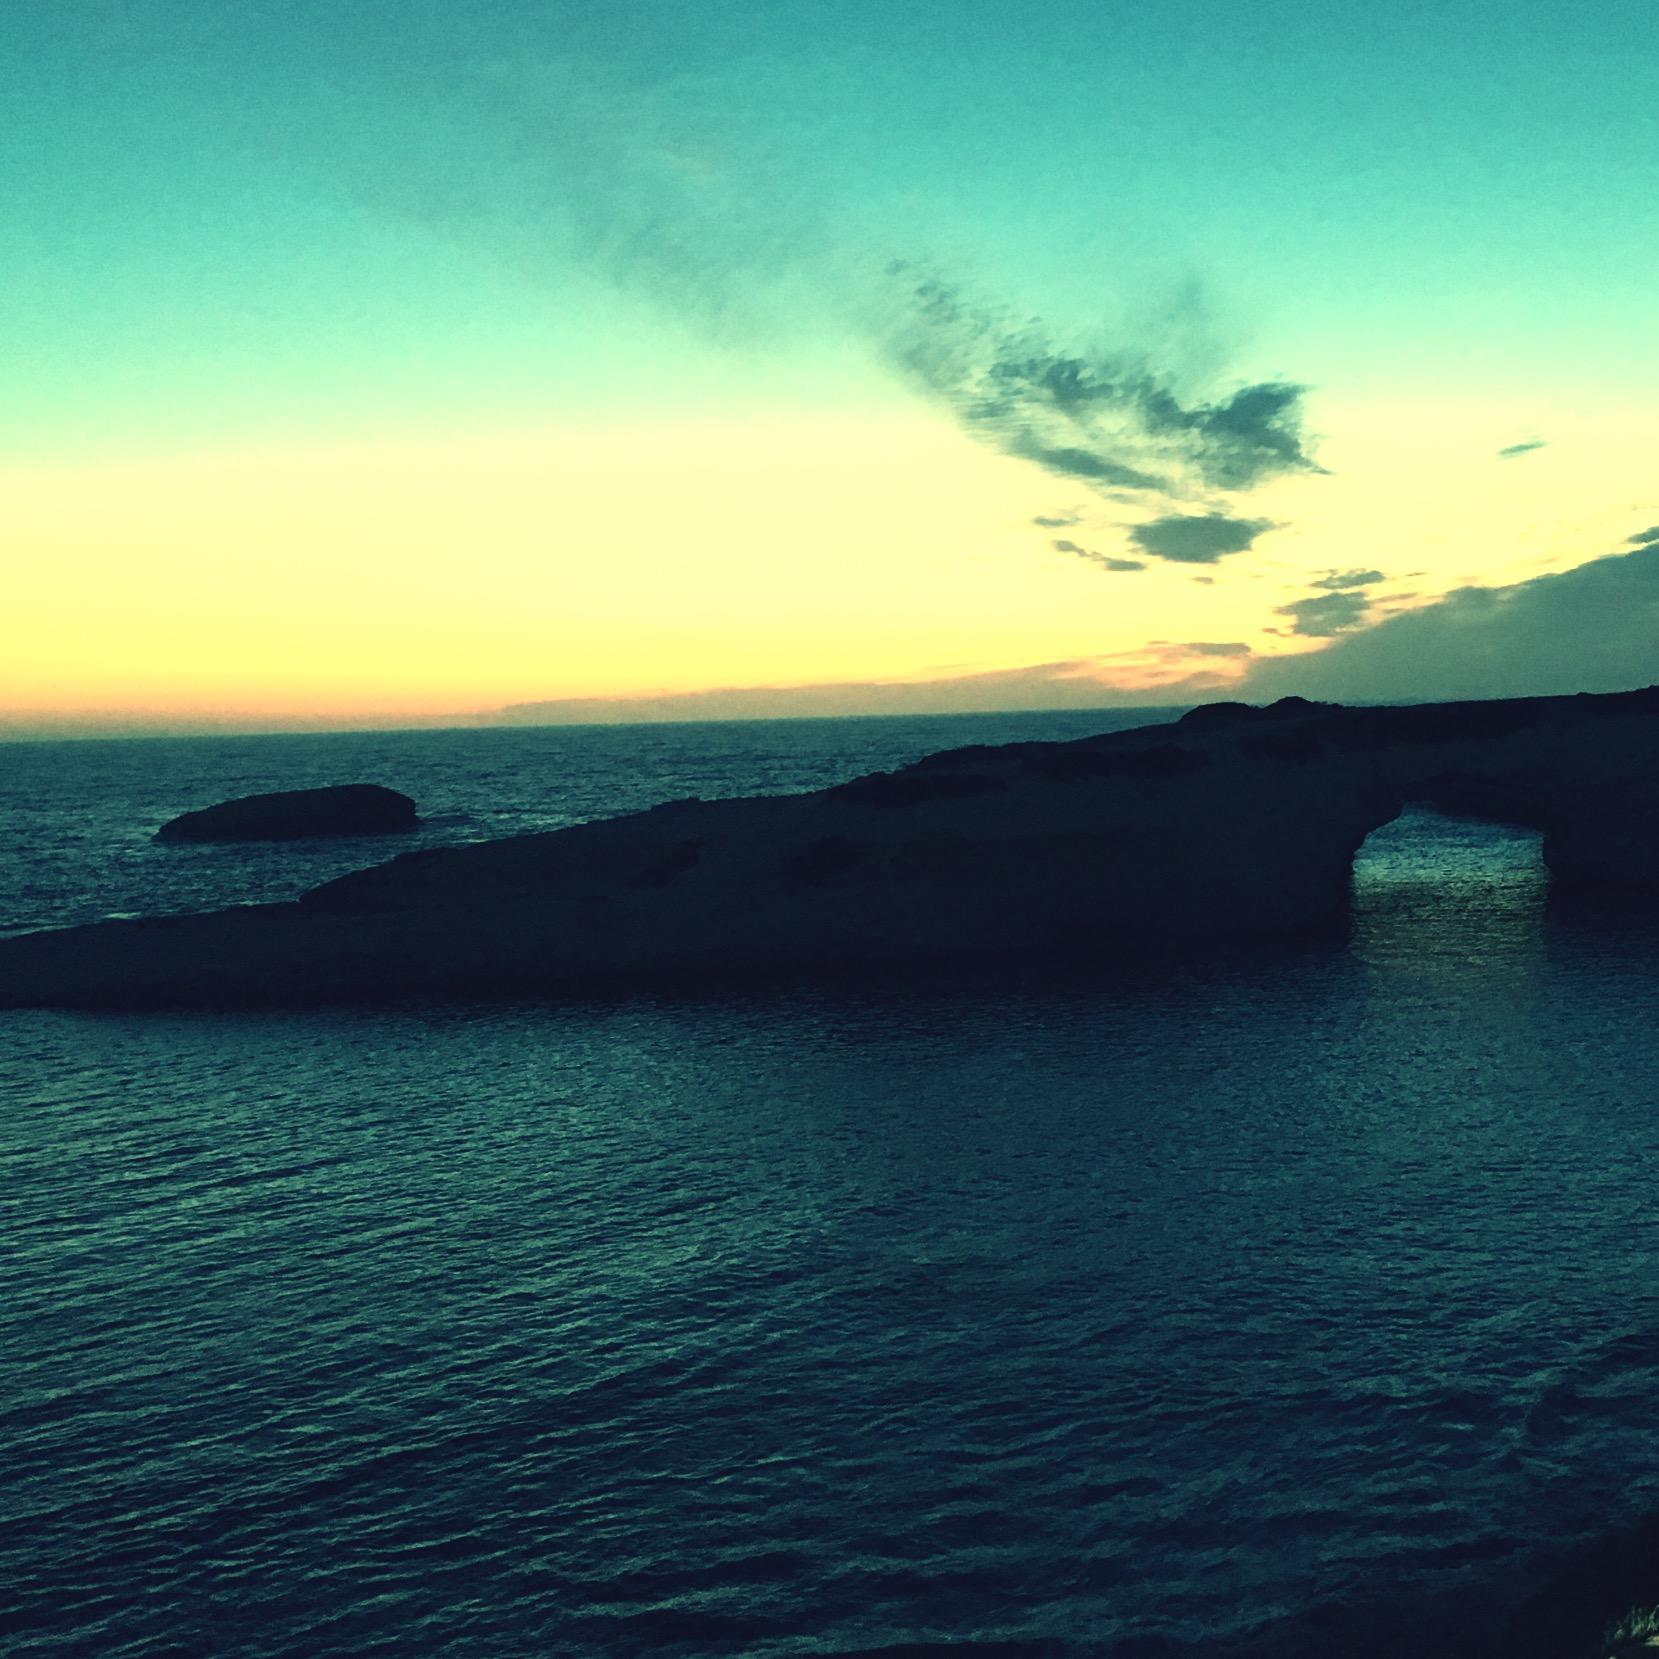 S'Archittu, Sardegna